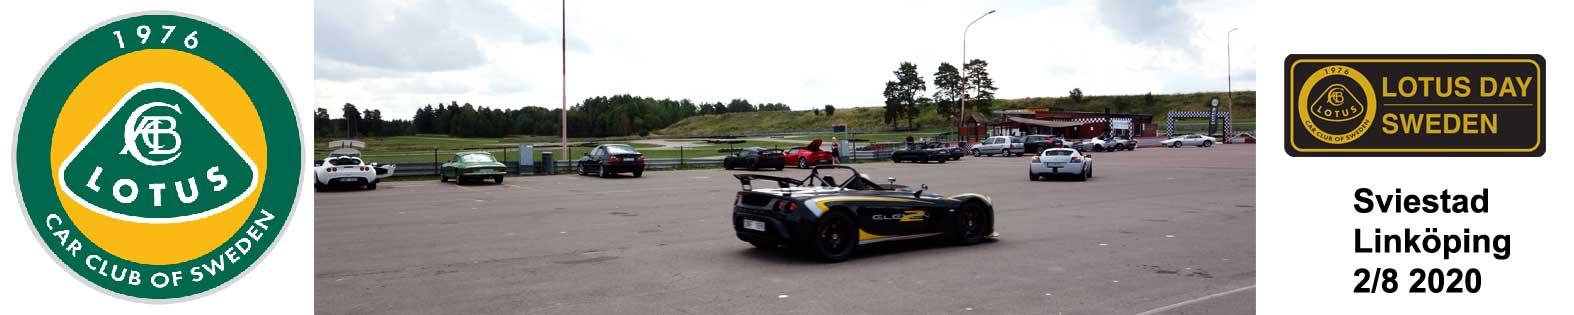 Lotus Car Club of Sweden